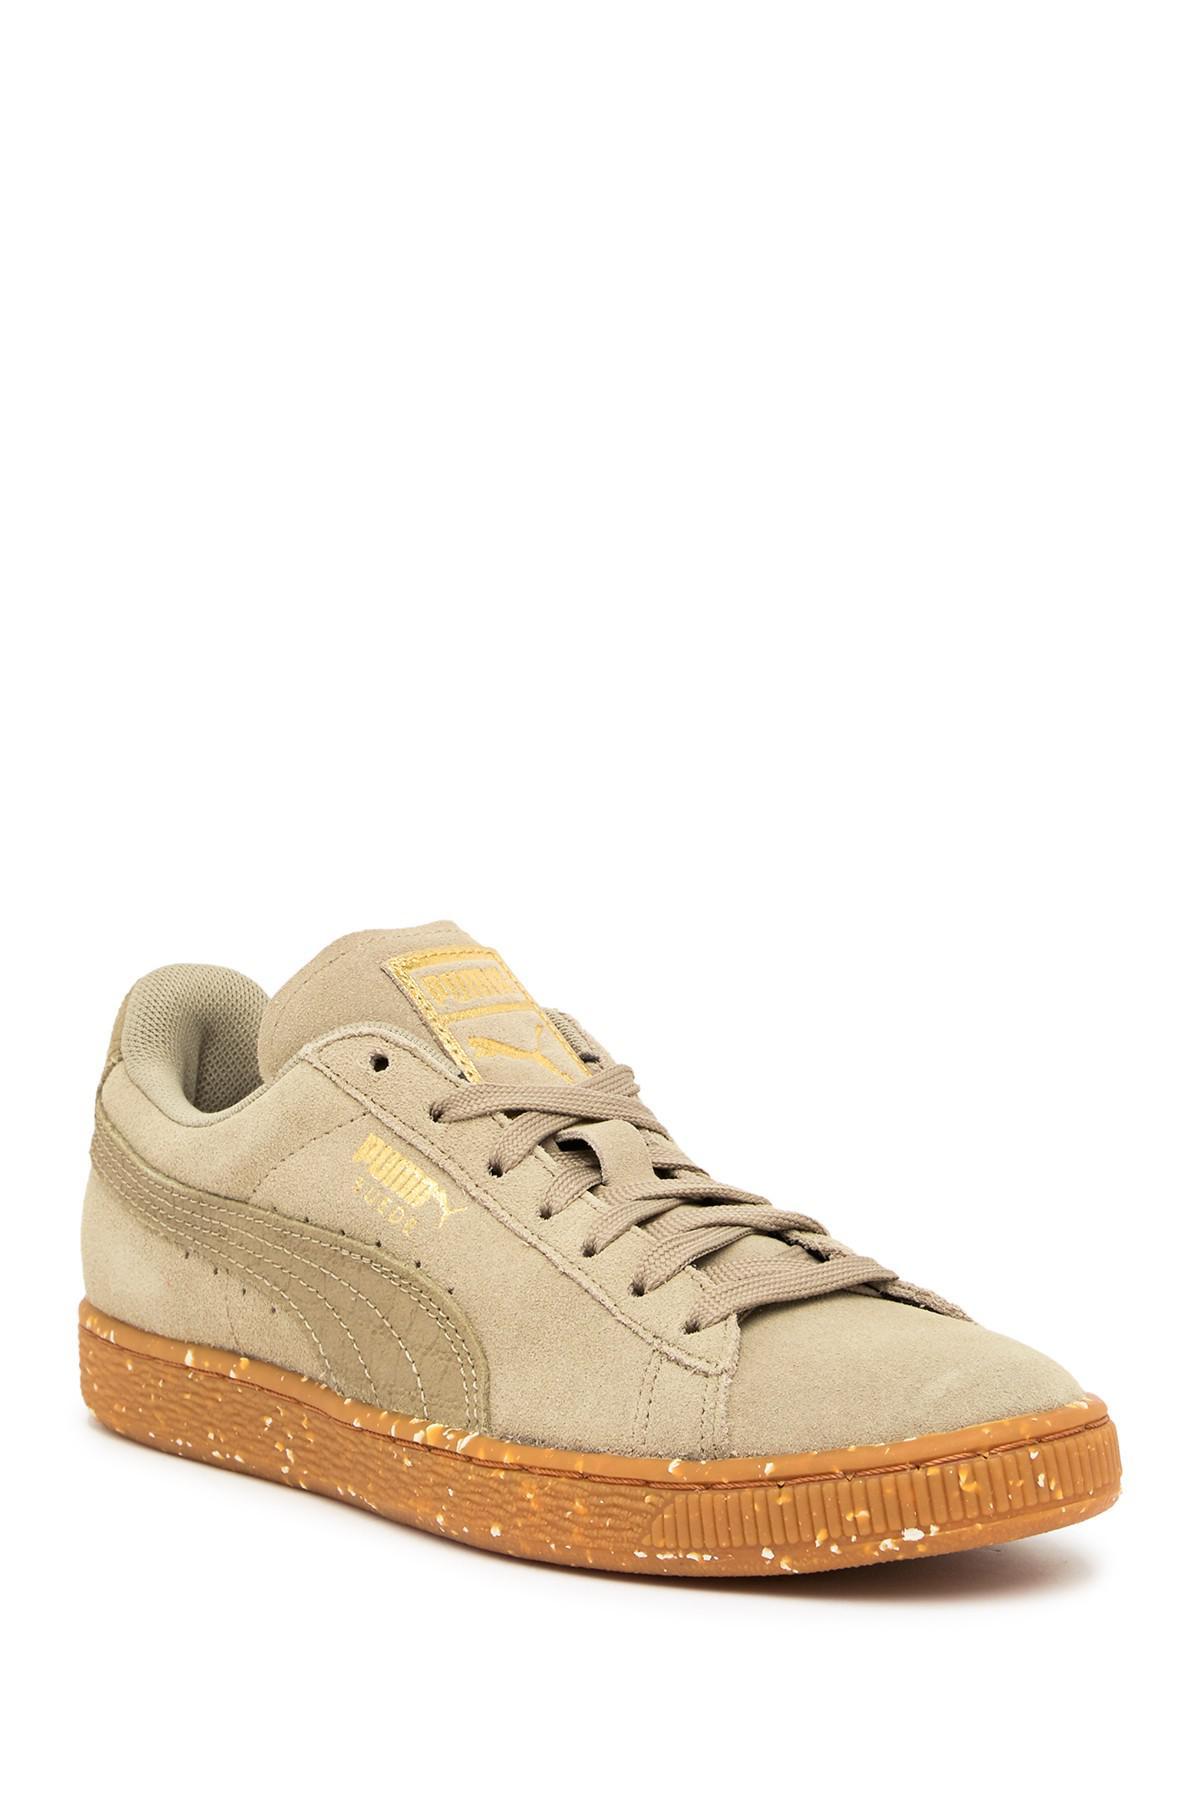 Lyst - PUMA Suede Classic Ft Sneaker in Brown for Men 15e5f5a77